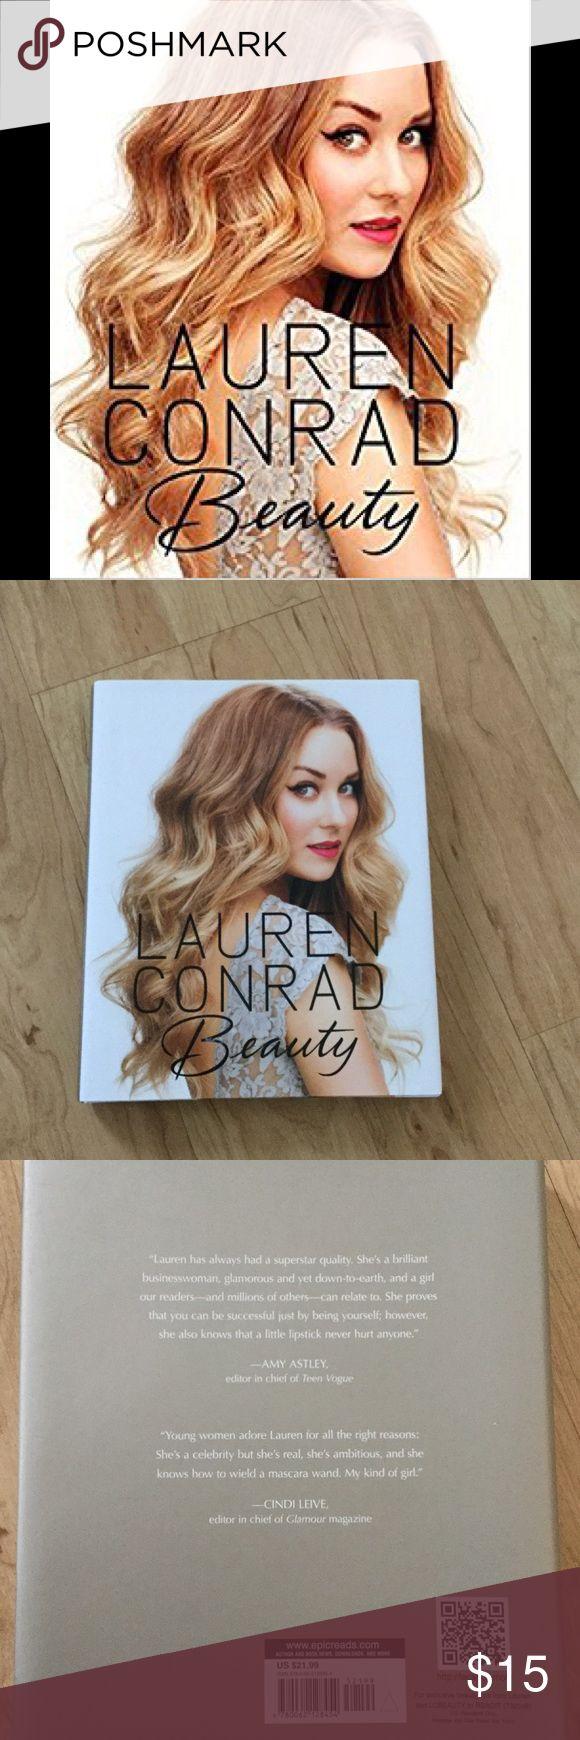 Lauren Conrad Beauty Book NWT Lauren Conrad Beauty Book